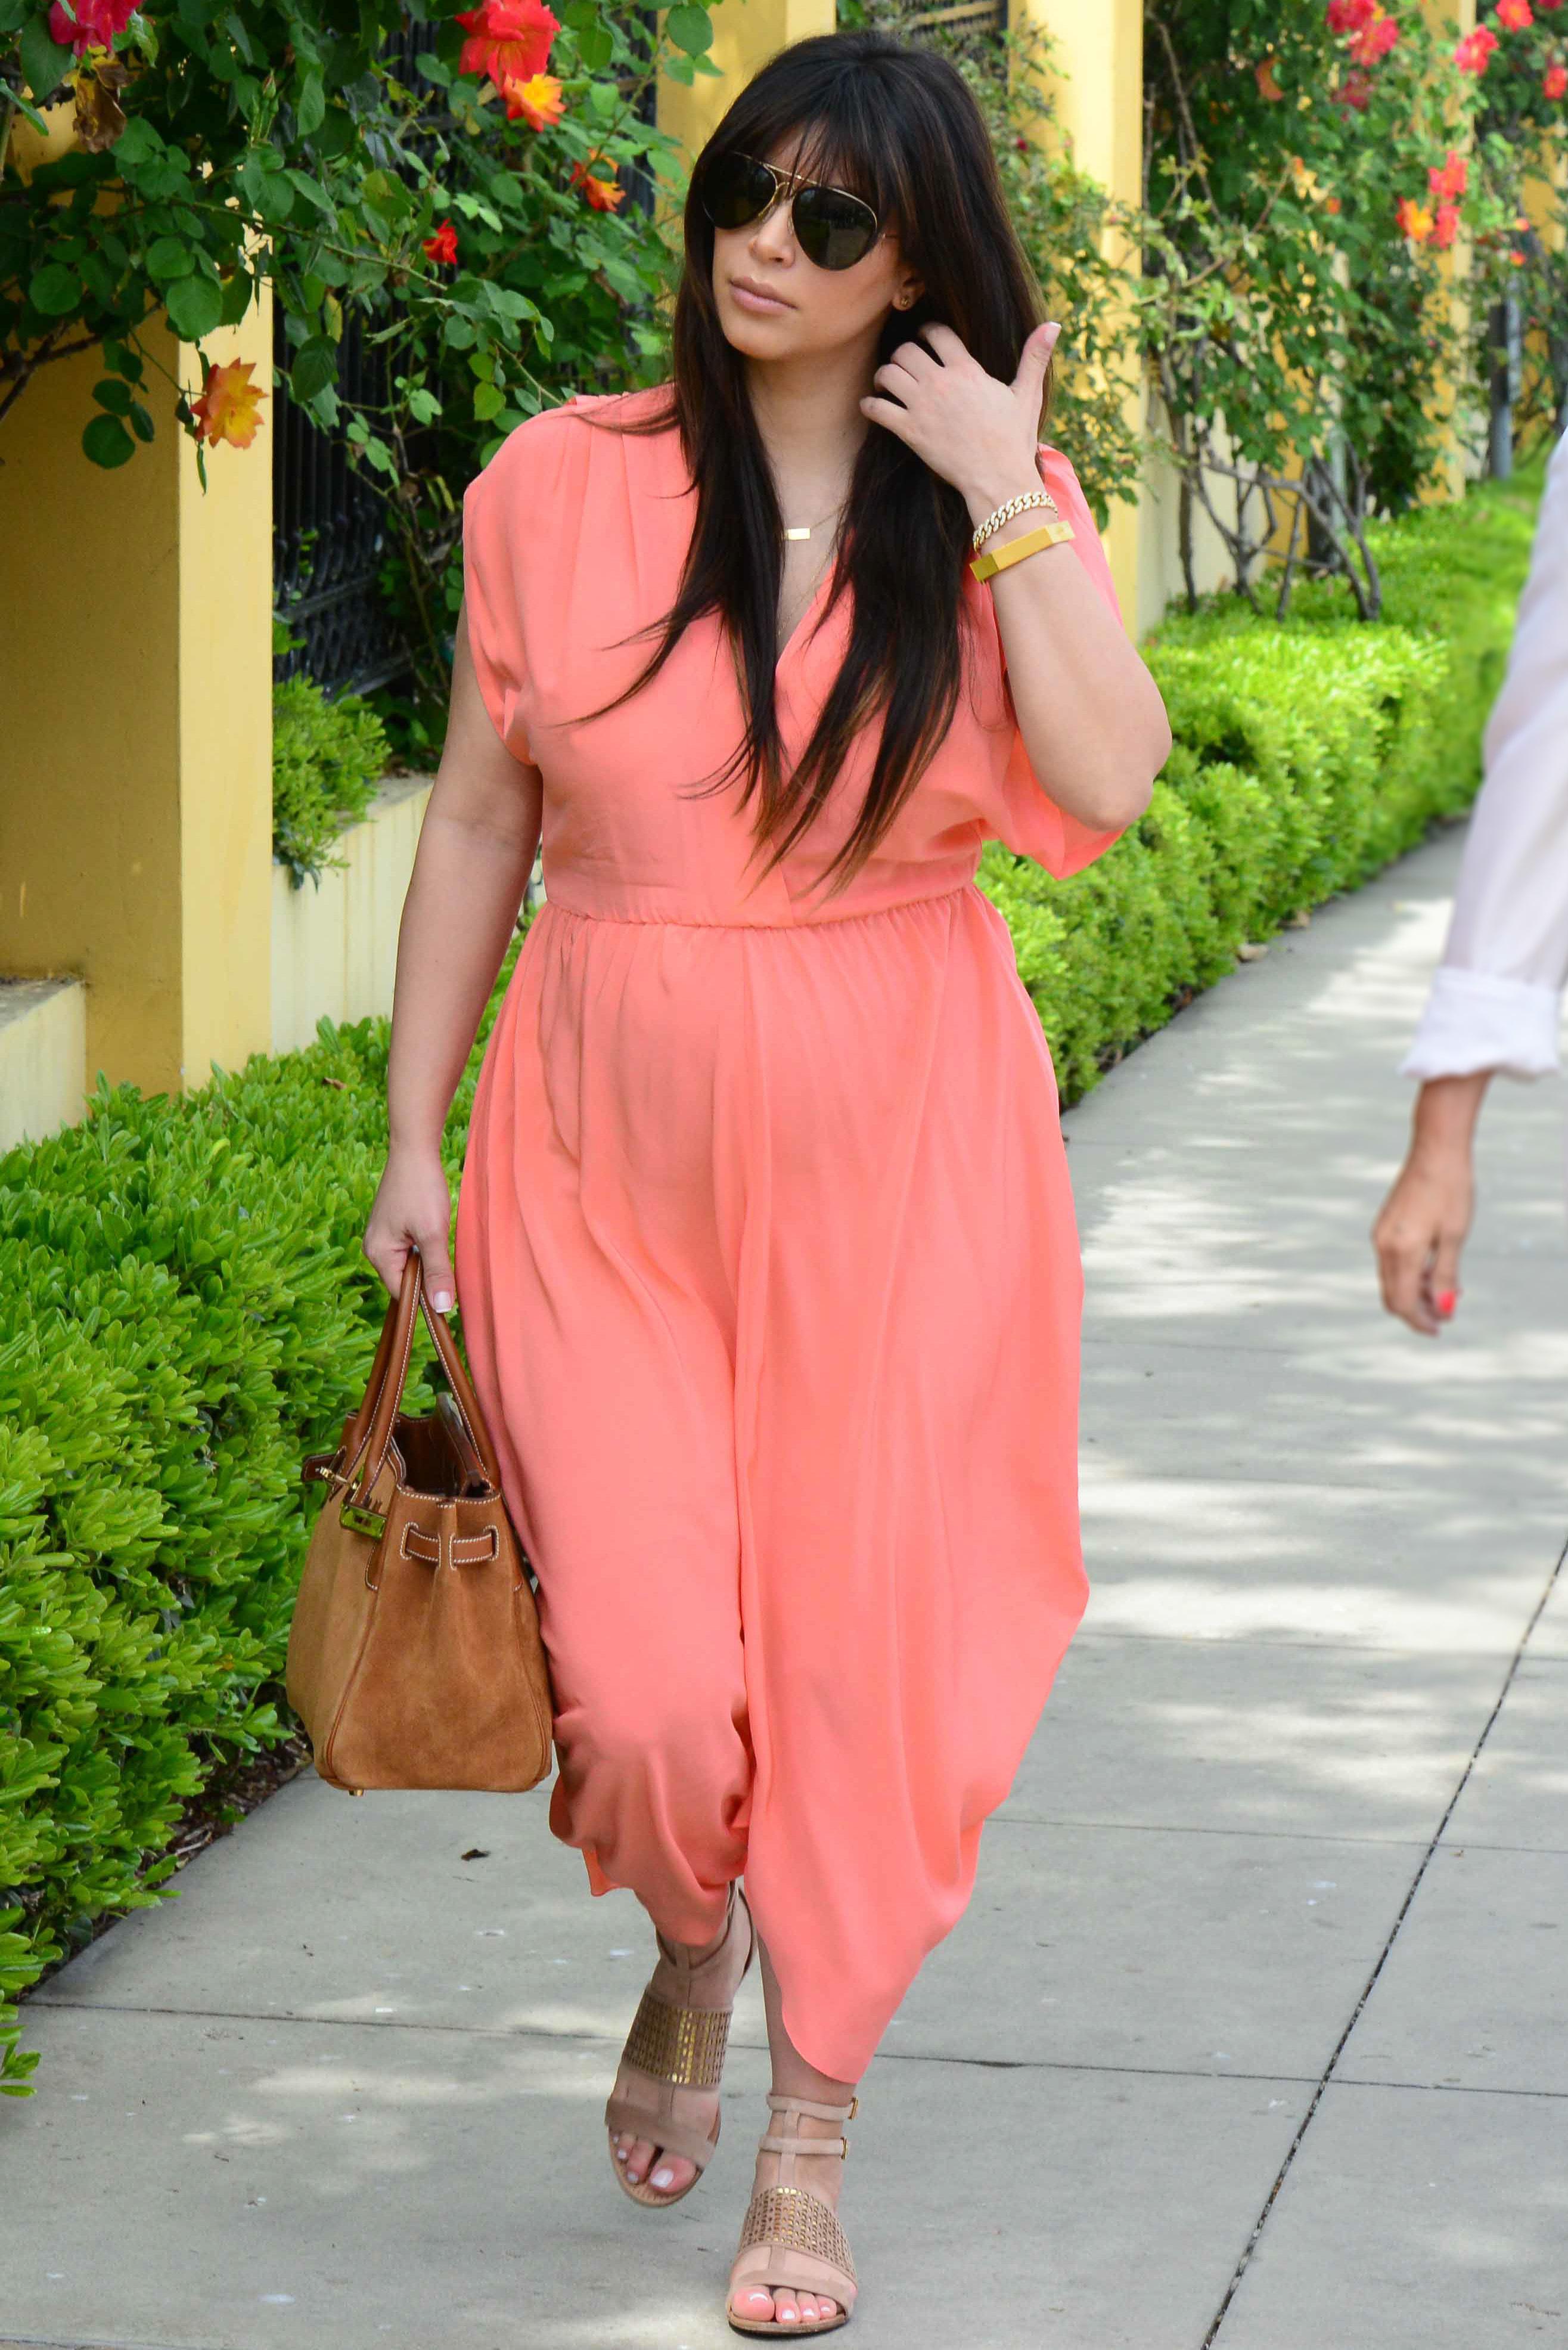 kim kardashian peach jumper